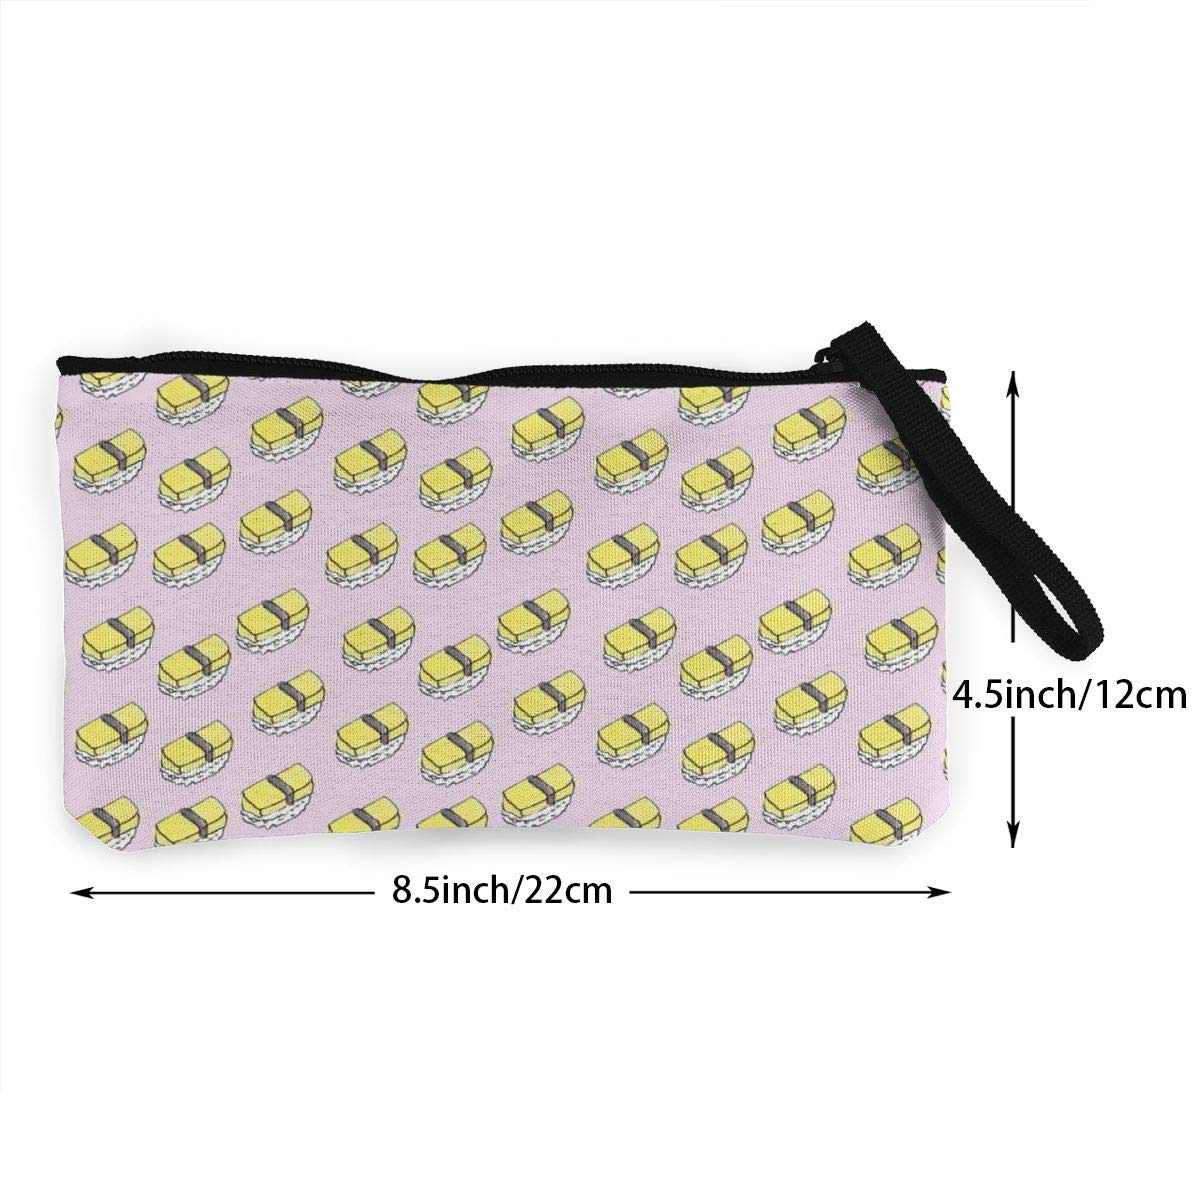 YUANSHAN Yellow Sushi Unisex Canvas Coin Purse Change Cash Bag Zipper Small Purse Wallets with Handle